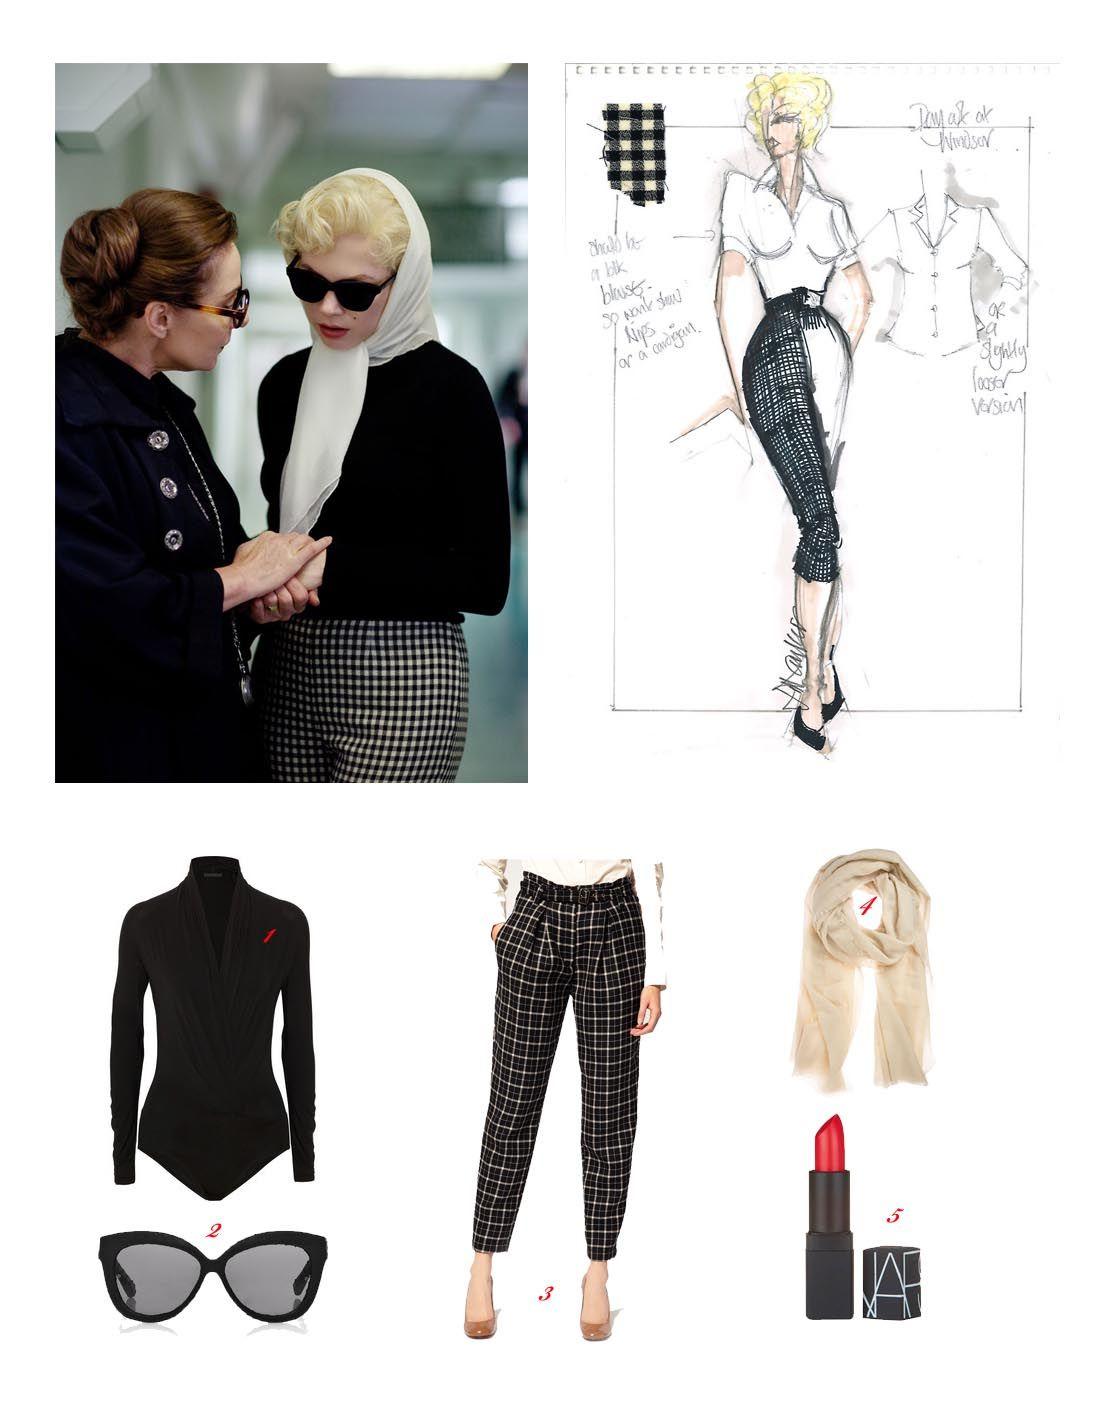 Marilyn Monroe style My week with Marilyn  sc 1 st  Pinterest & Marilyn Monroe style My week with Marilyn | 50s bombshell u0026 pin ups ...